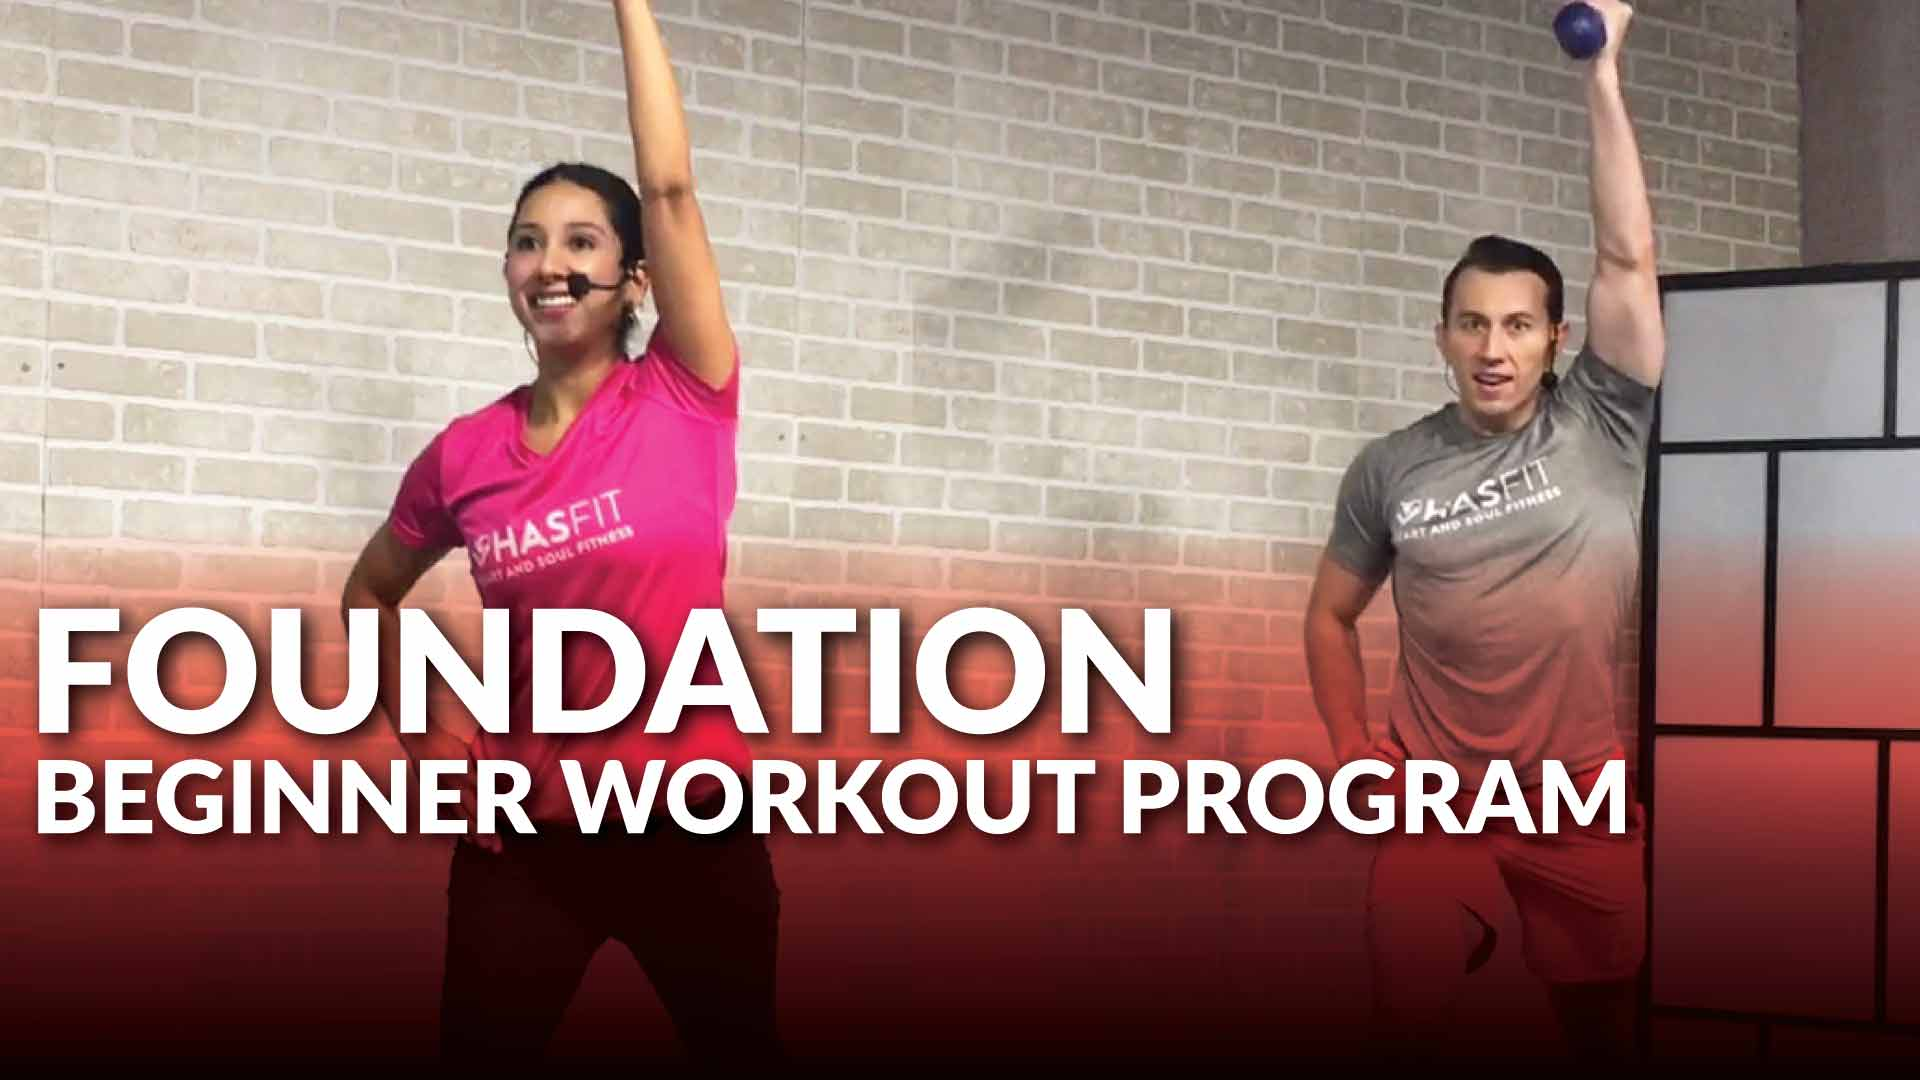 HASfit's Foundation Beginner Workout Program - HASfit - Free